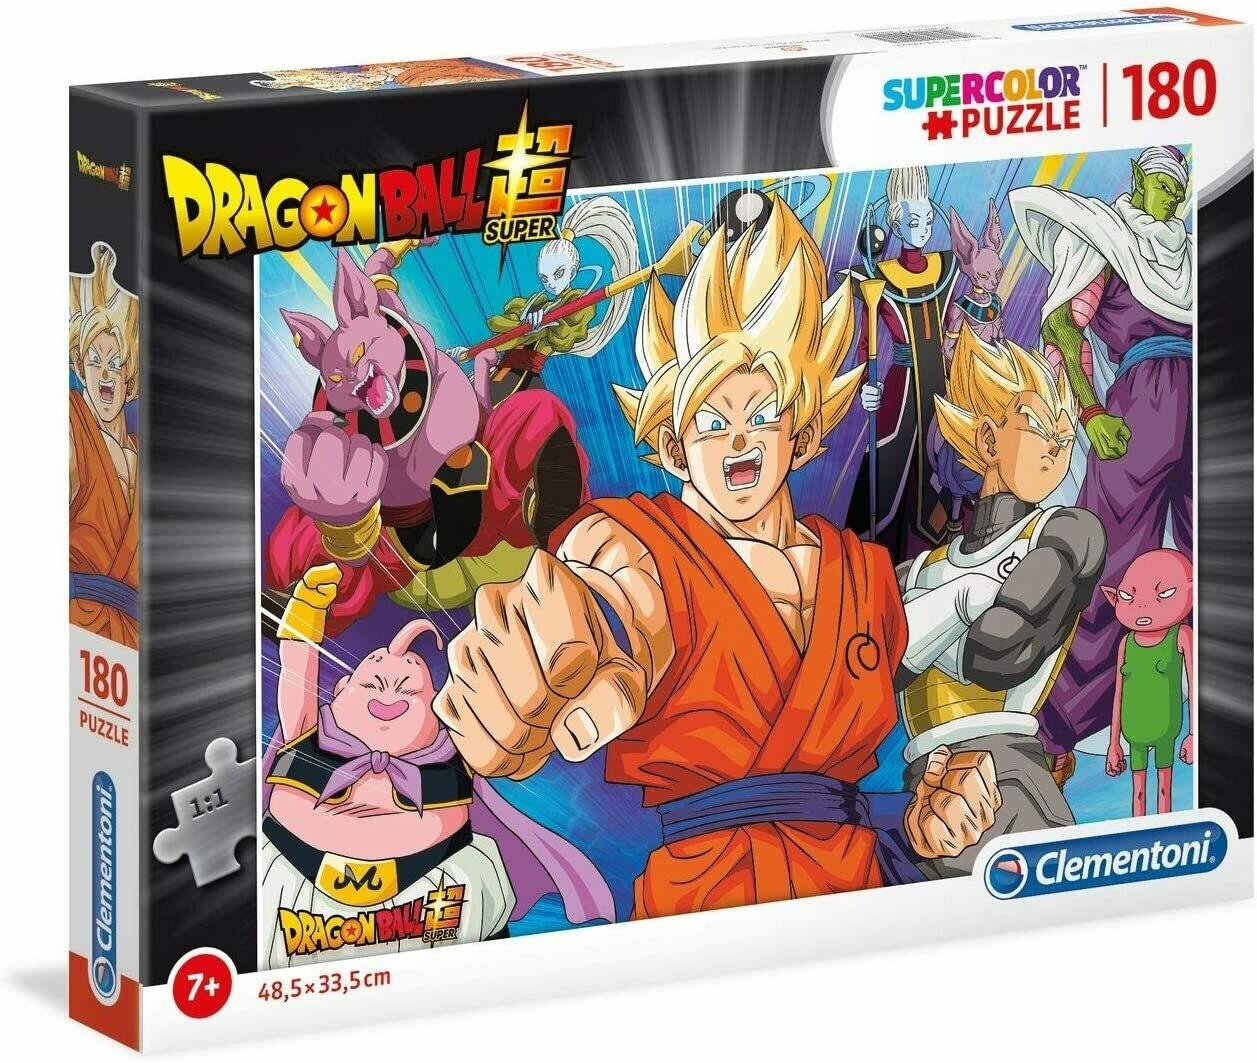 PUZZLE Super 180 pcs Dragon Ball - CLEMENTONI